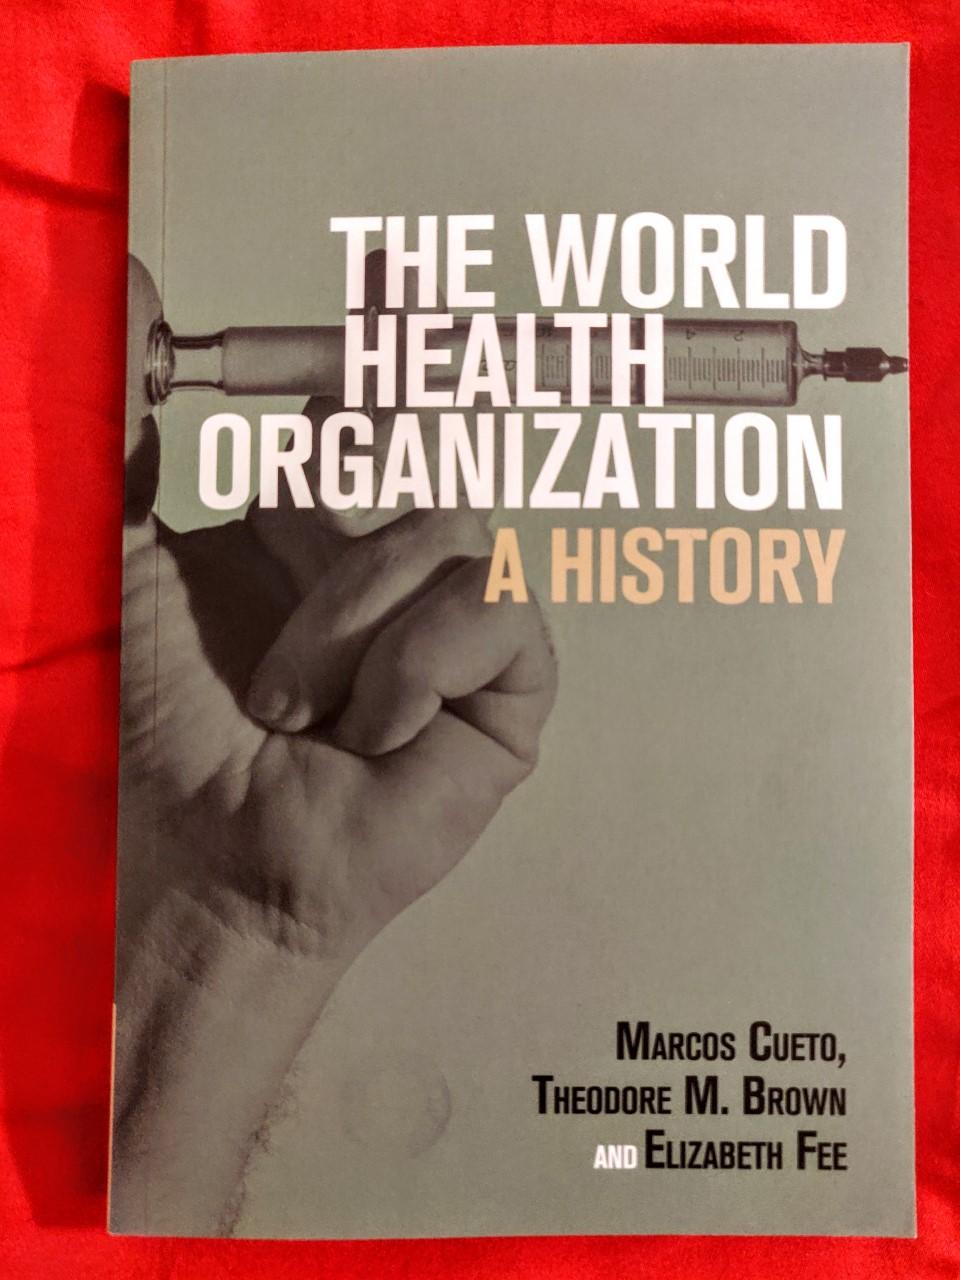 Cover book The World Health Organization, A History (by Marcos Cueto, Theodore M. Brown, Elizabeth Fee. Cambridge University Press, 2019).